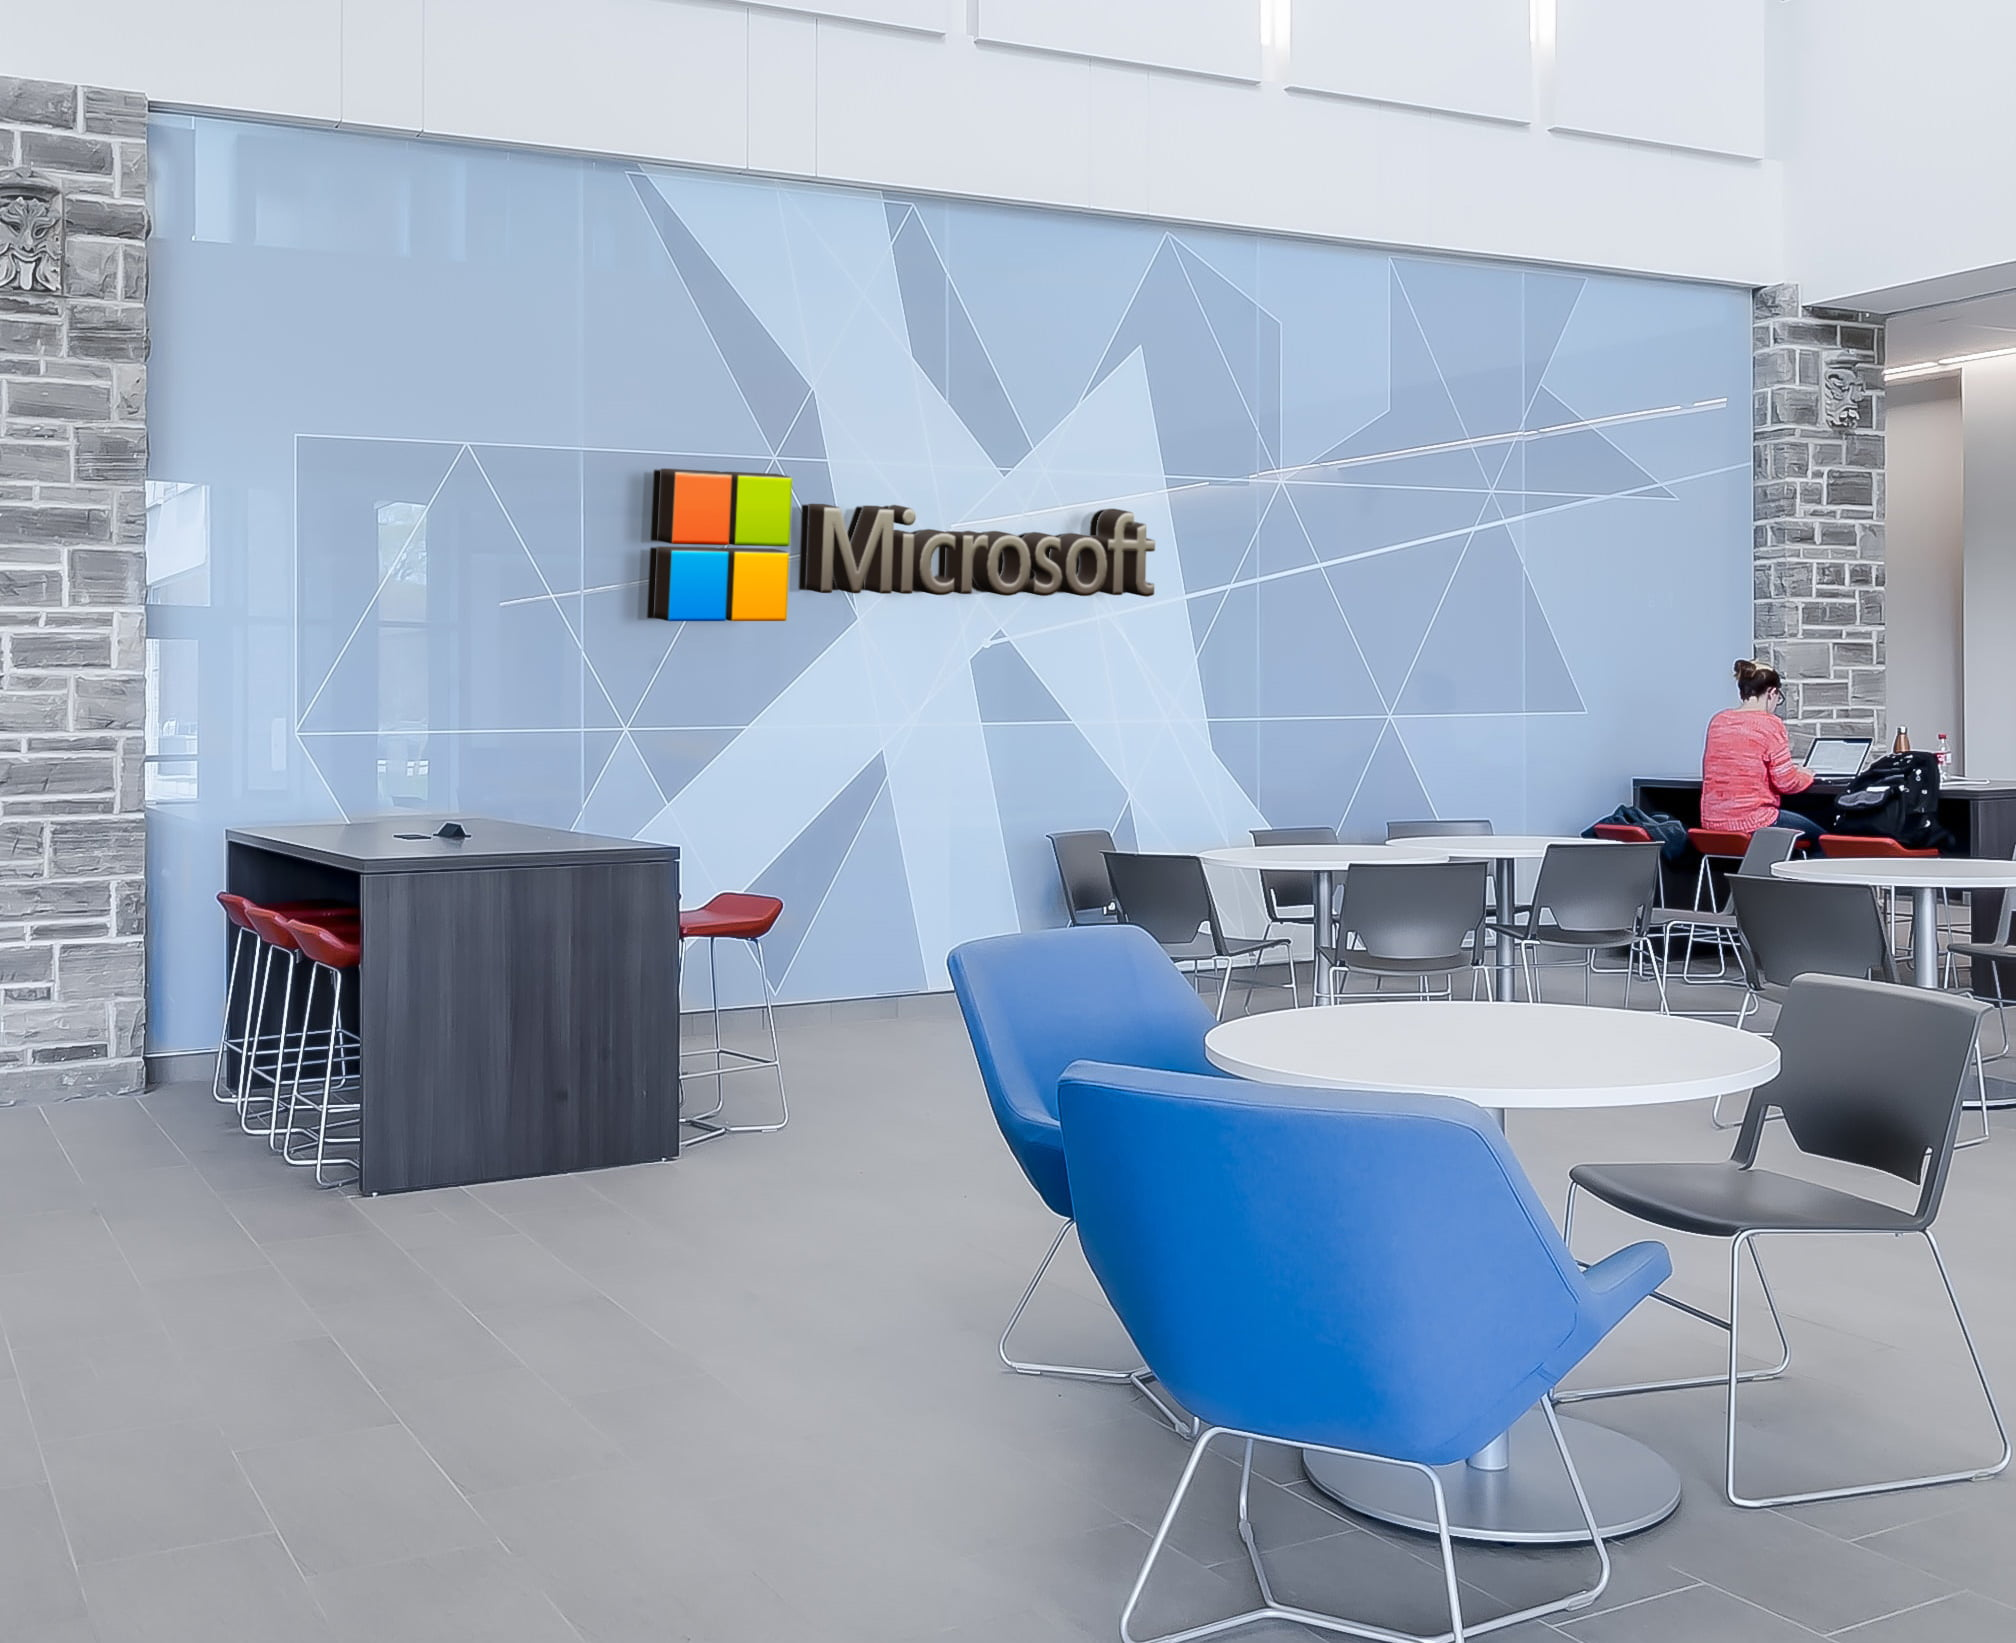 Microsoft-logo-Free-Lobby-Conference-Room-Mockup.jpg